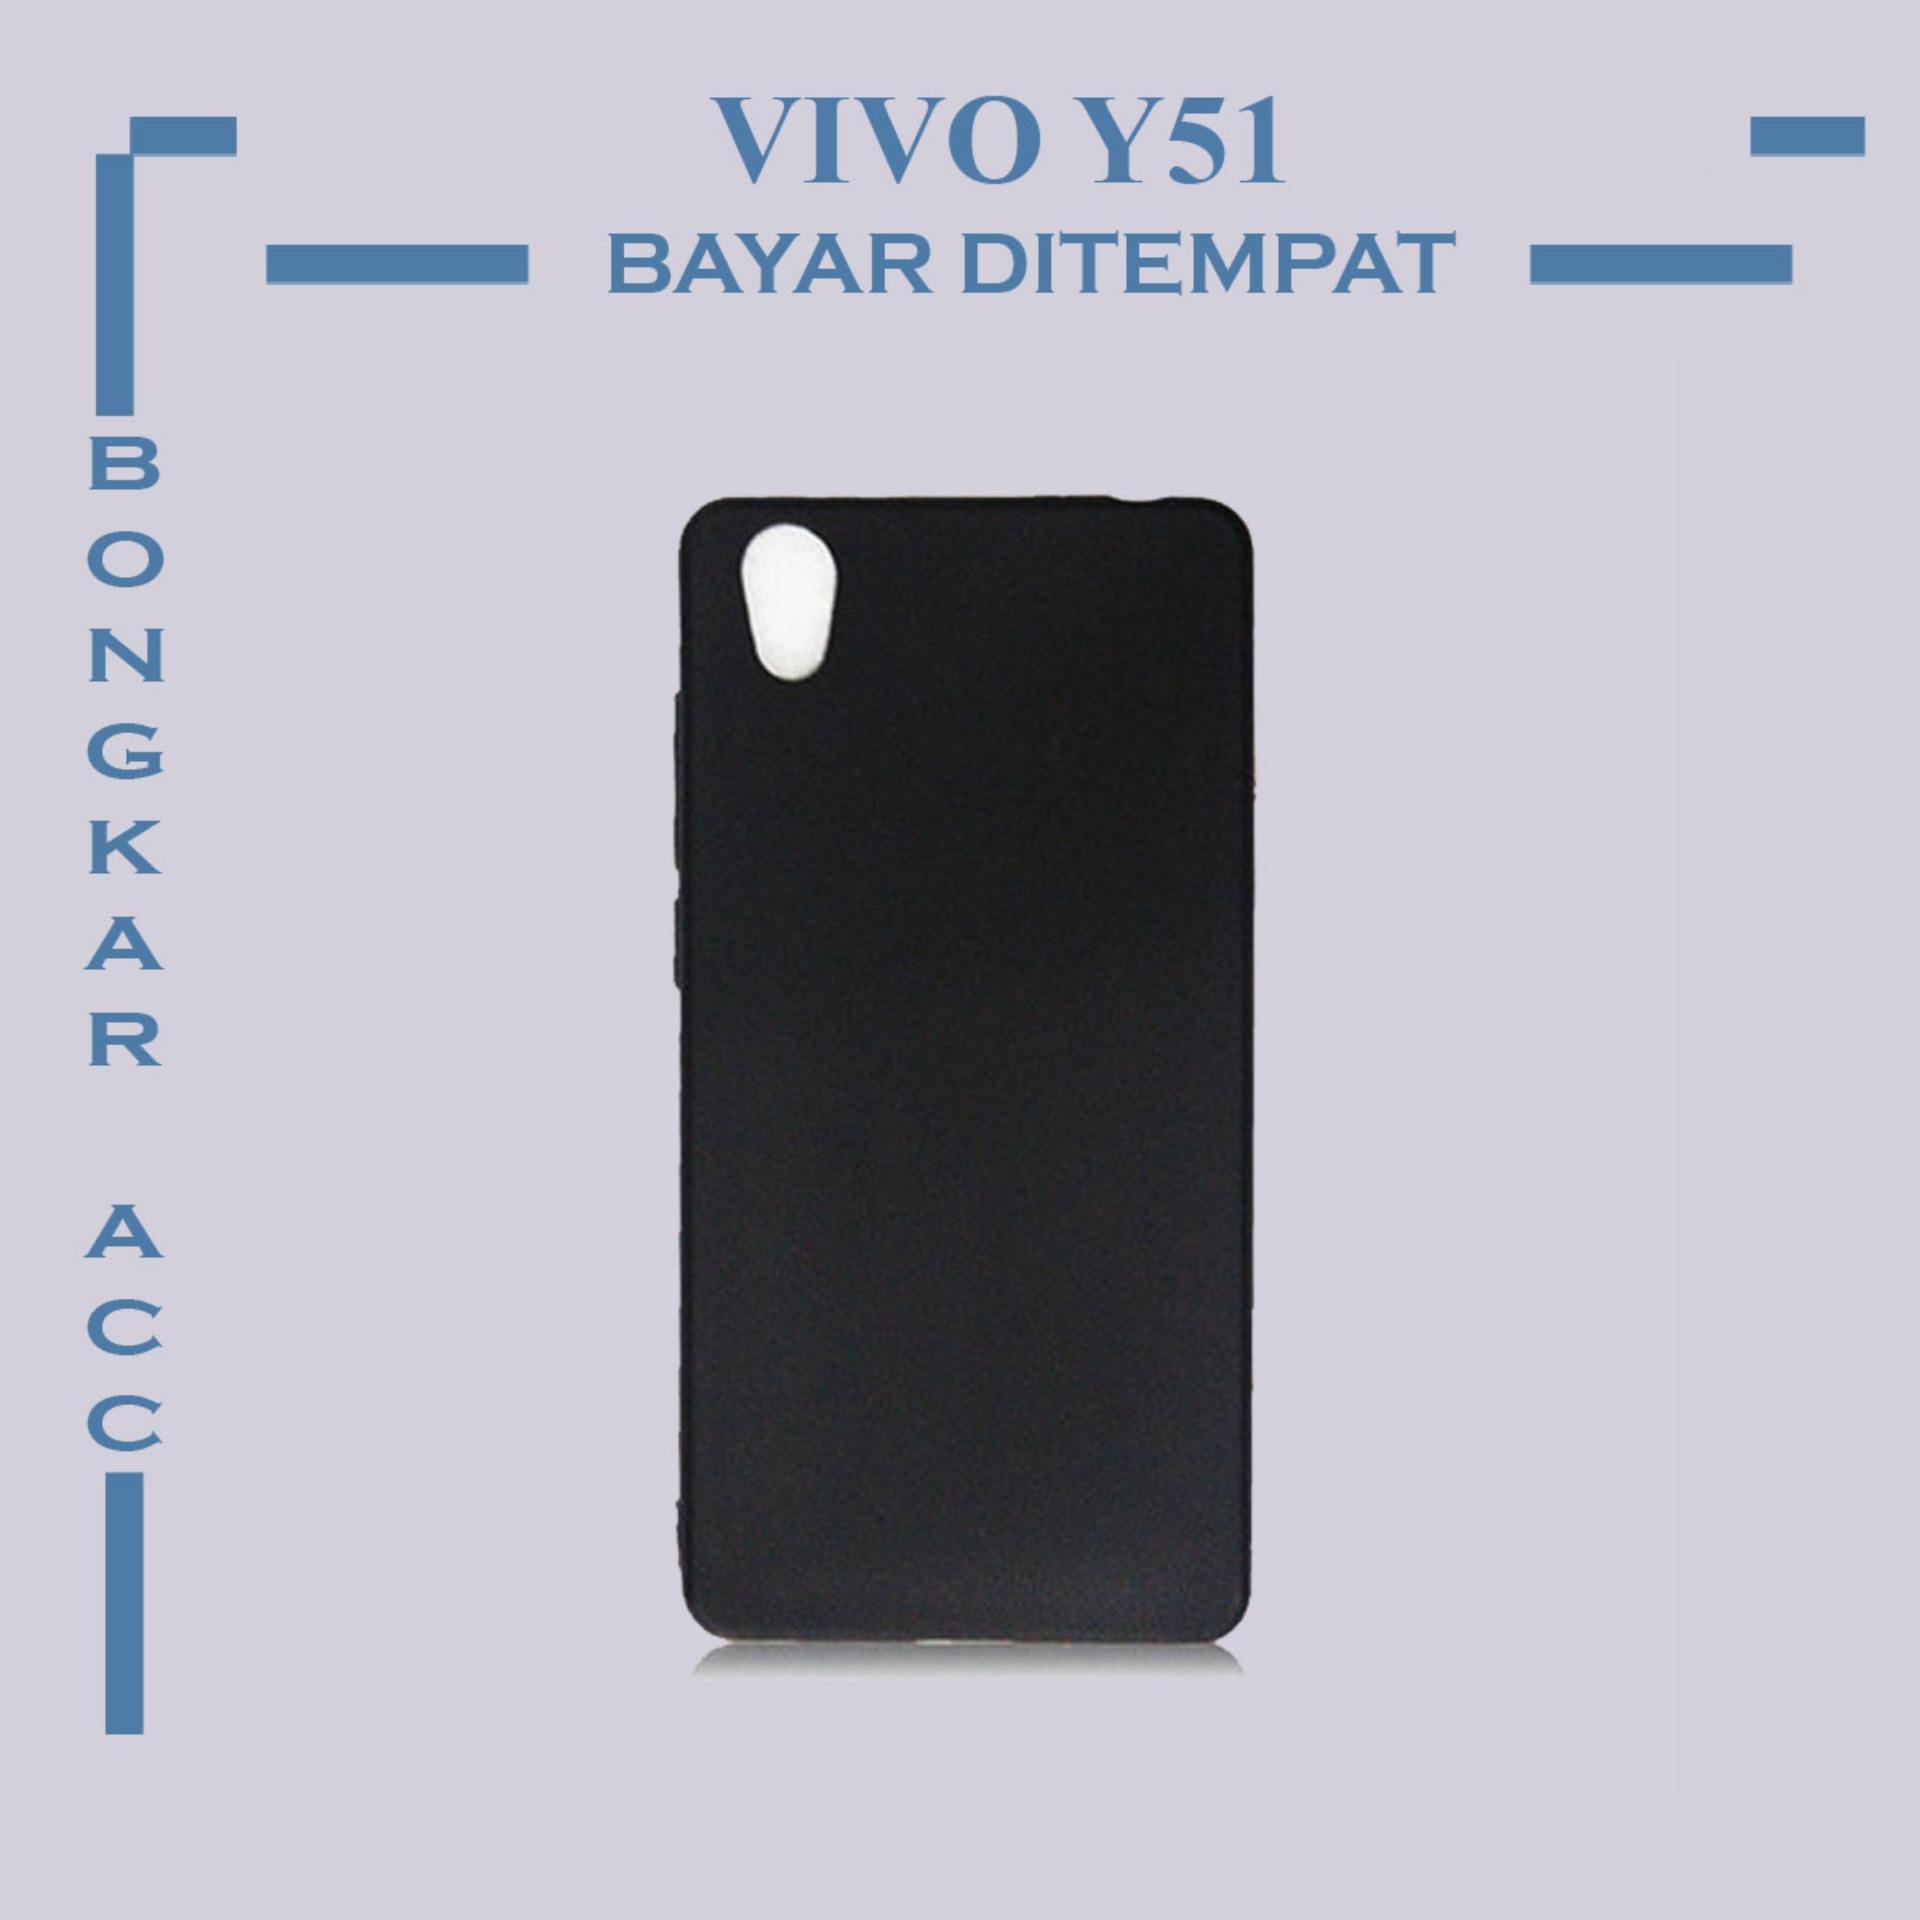 Vivo Y51 Casing Hp Black Matte Ultraslim Shockproof Black Color Casing Hp Black Matte Vivo Y51